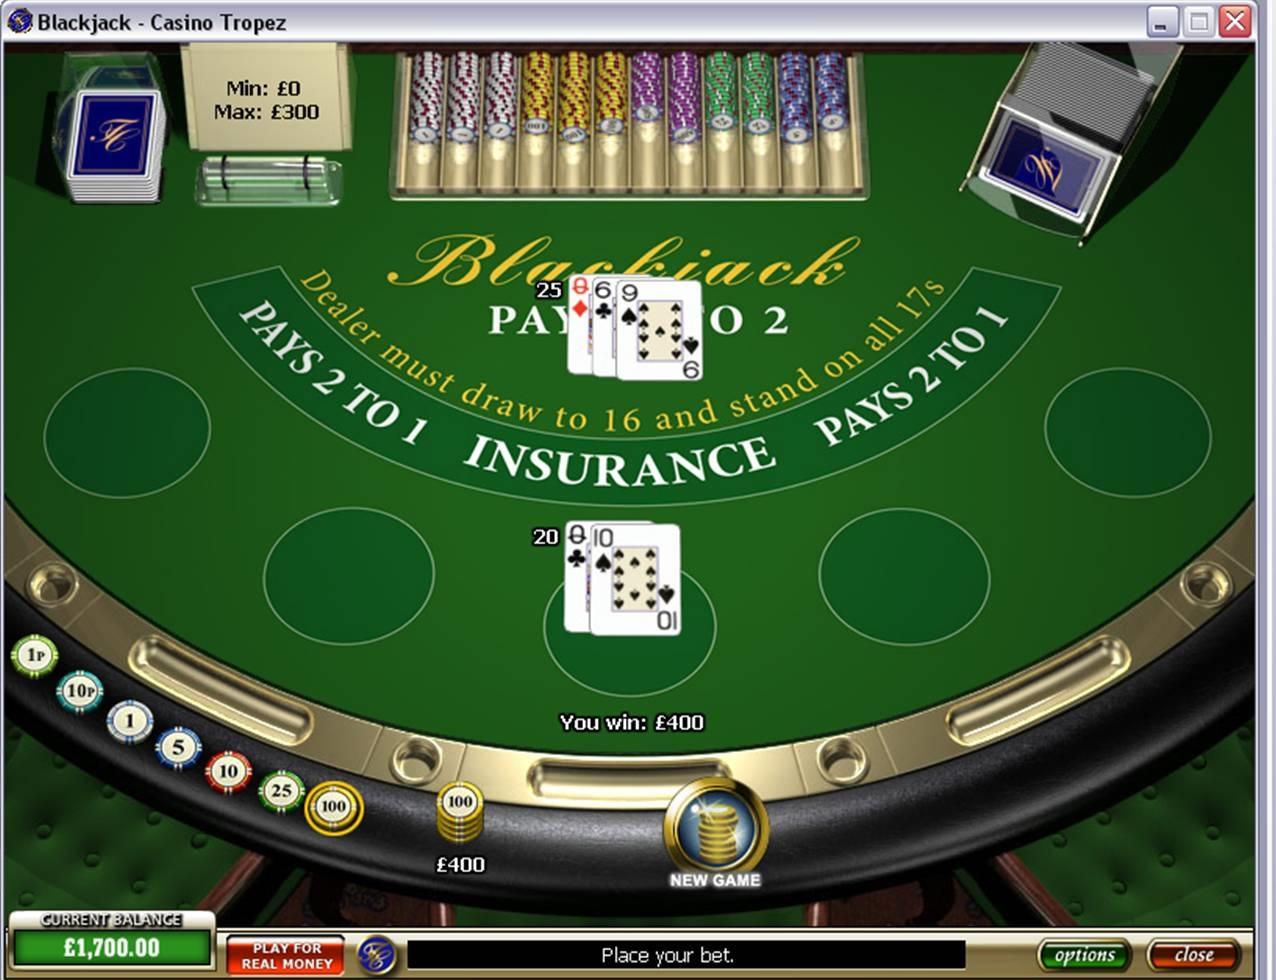 Guts的$ 400赌场锦标赛免费比赛